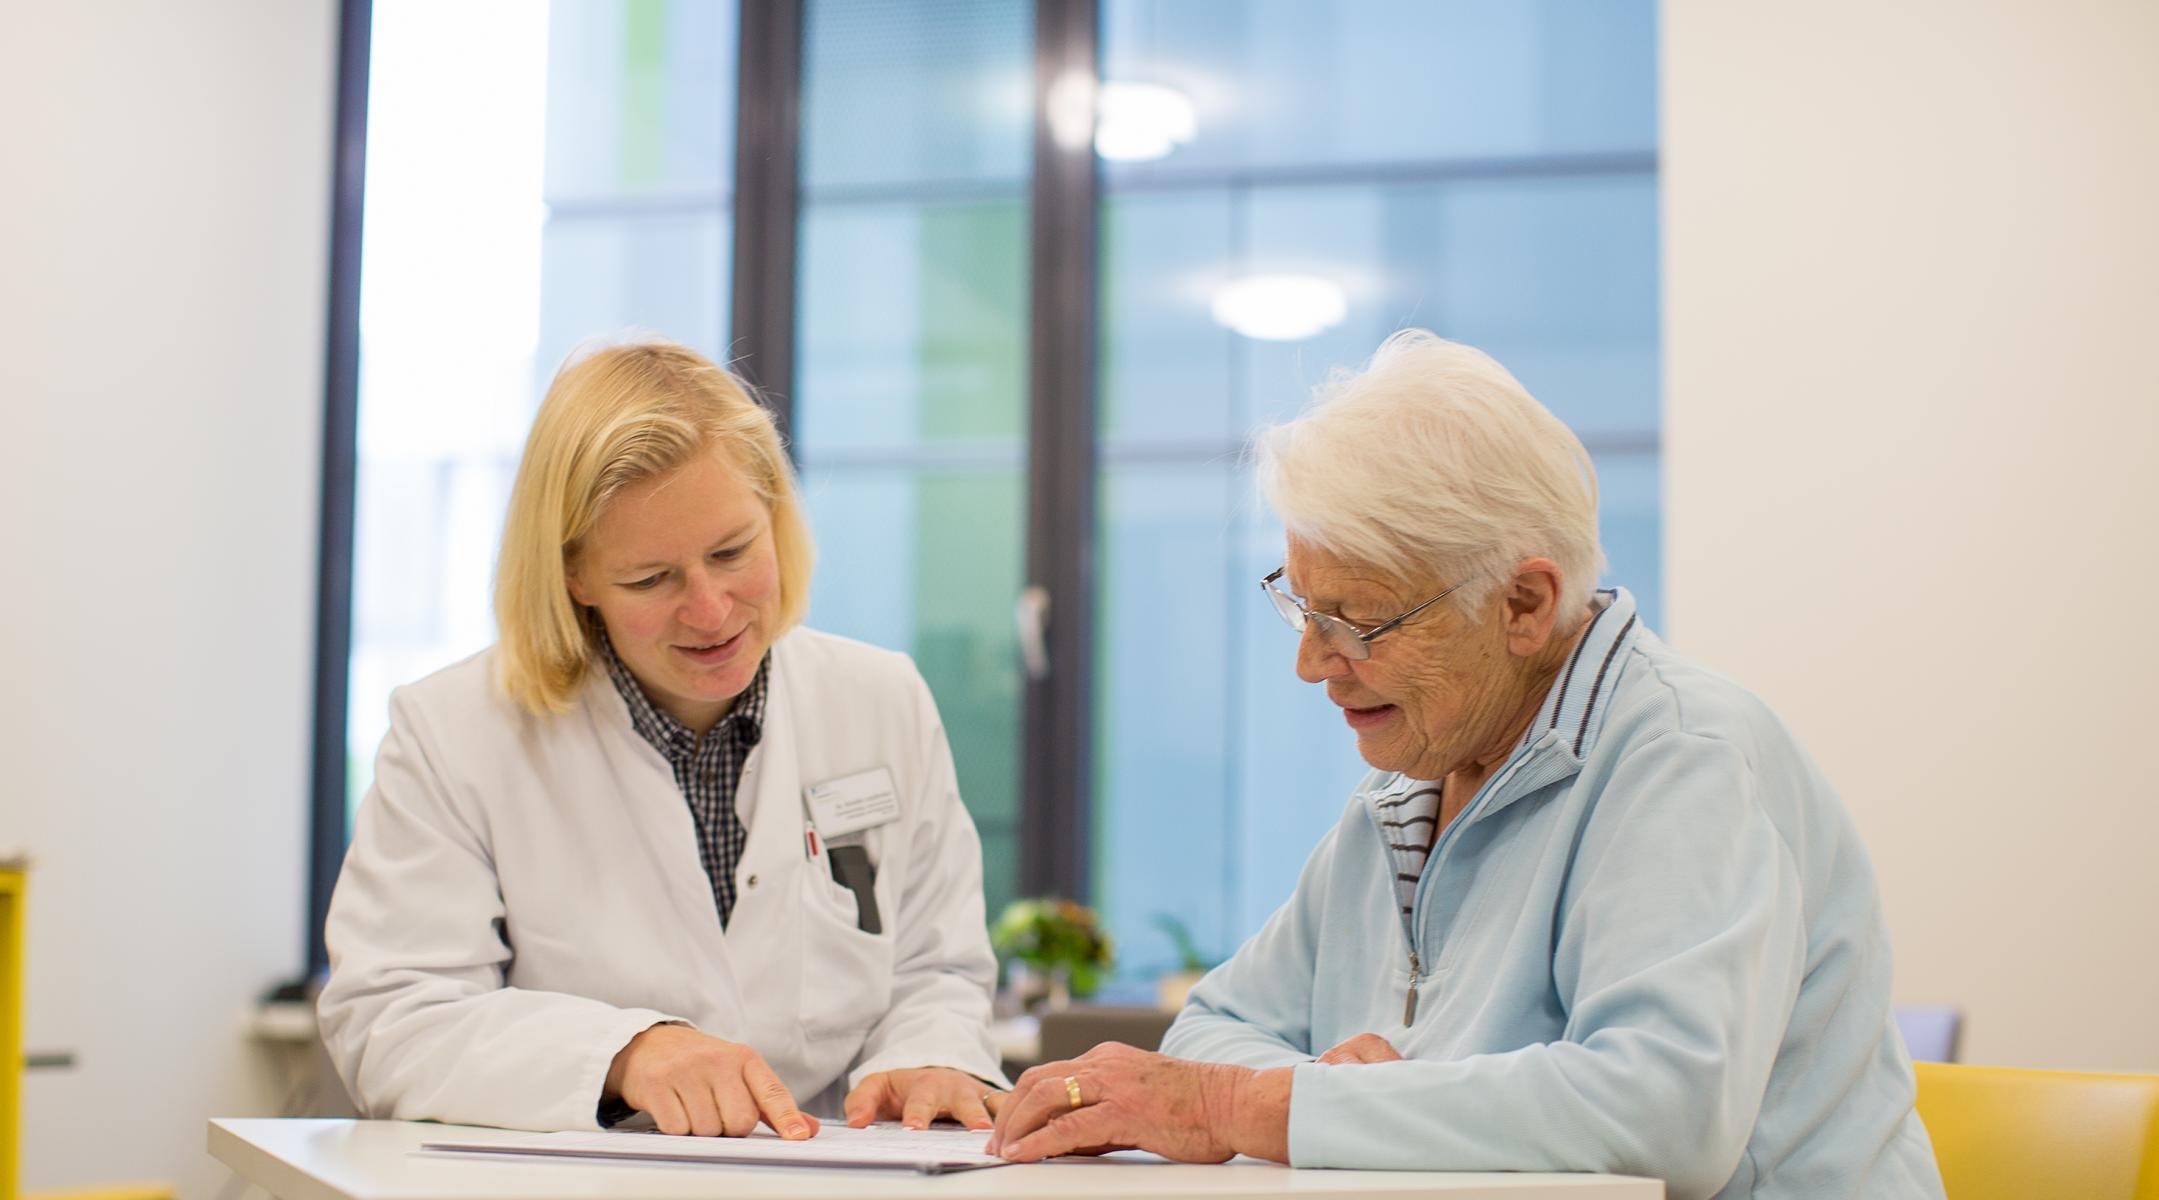 krh klinikum siloah hannover kontaktieren dialode